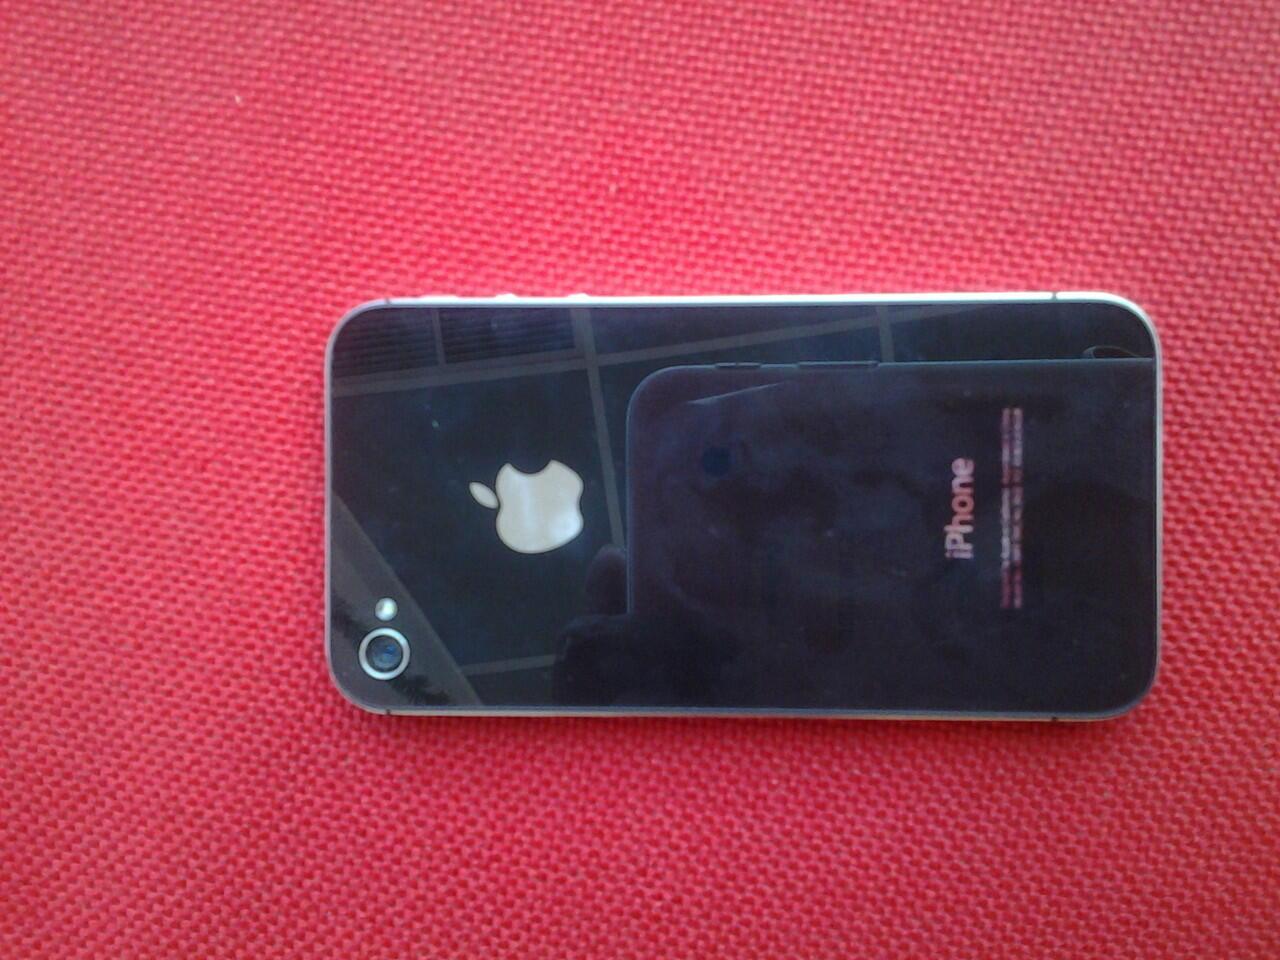 iphone 4 cdma black 8gb mulus dan murah